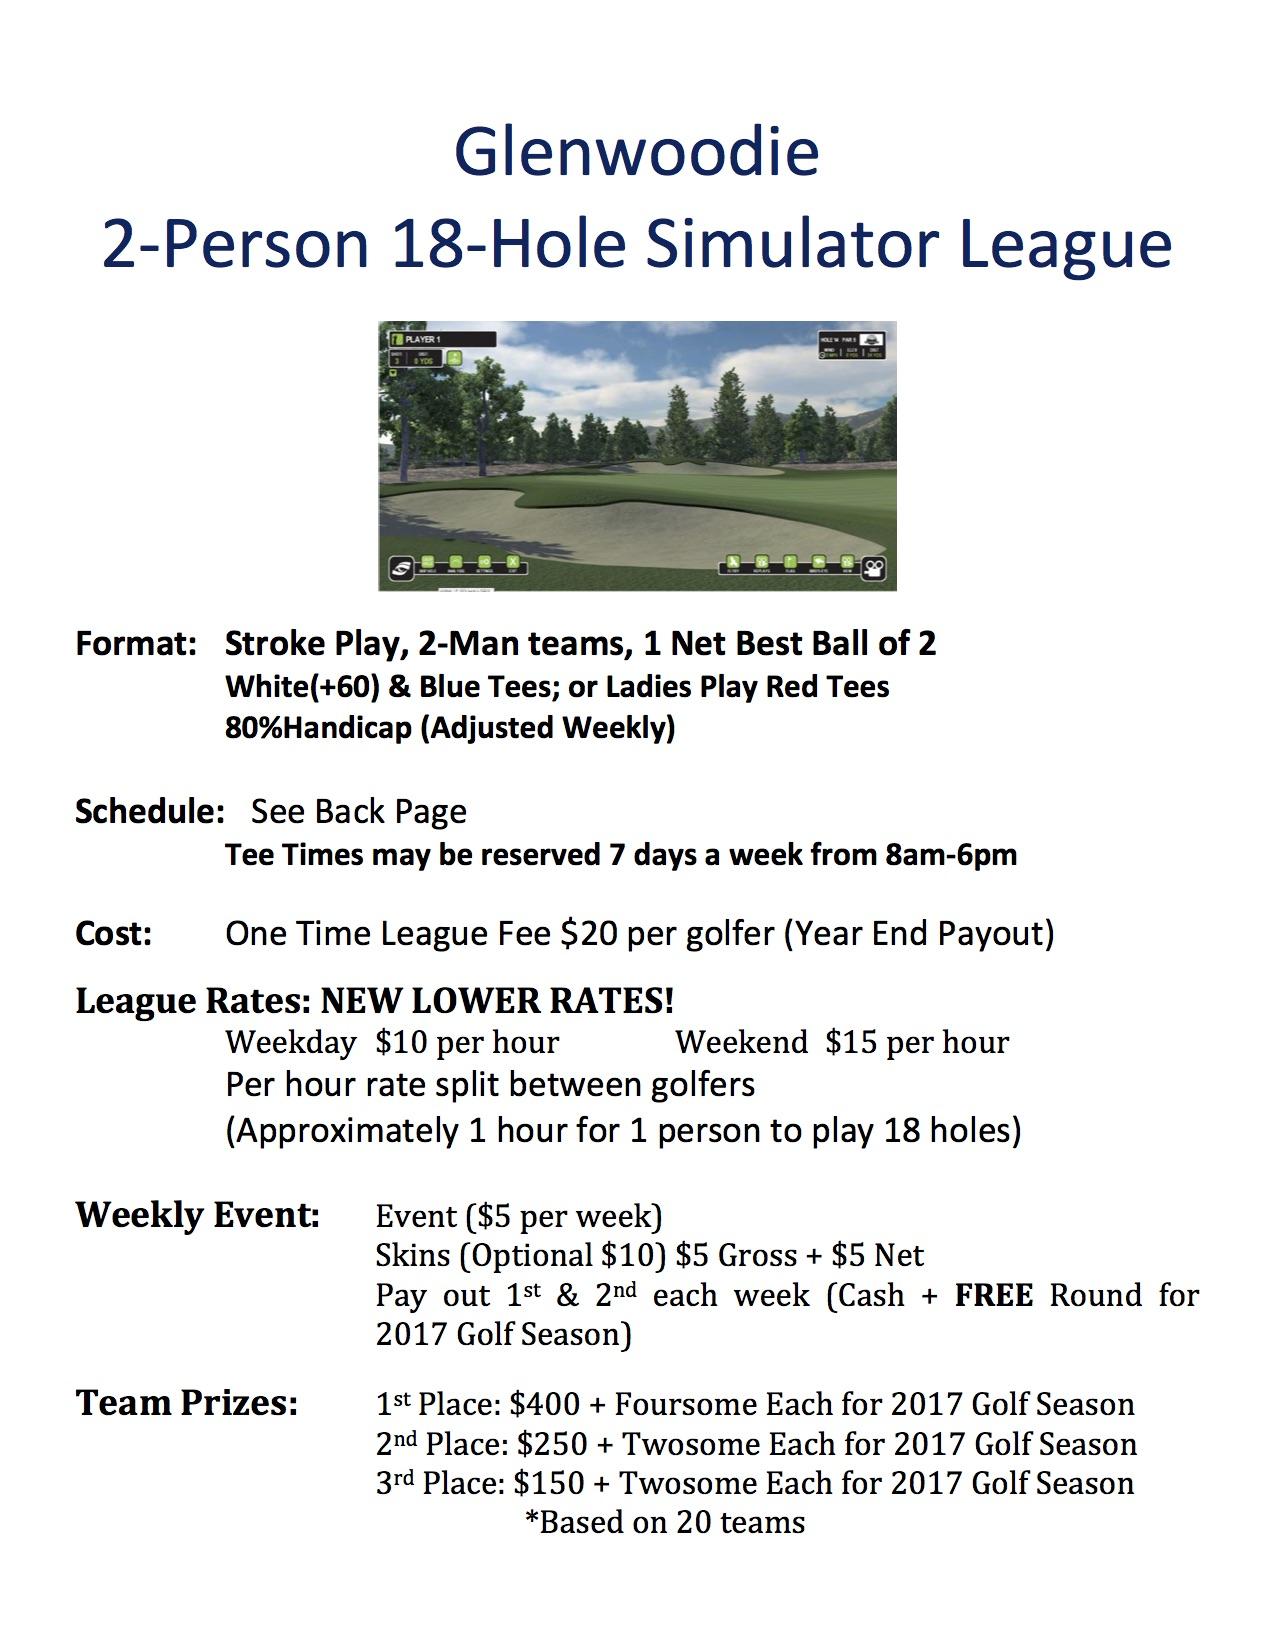 simulator-league-2016-2017